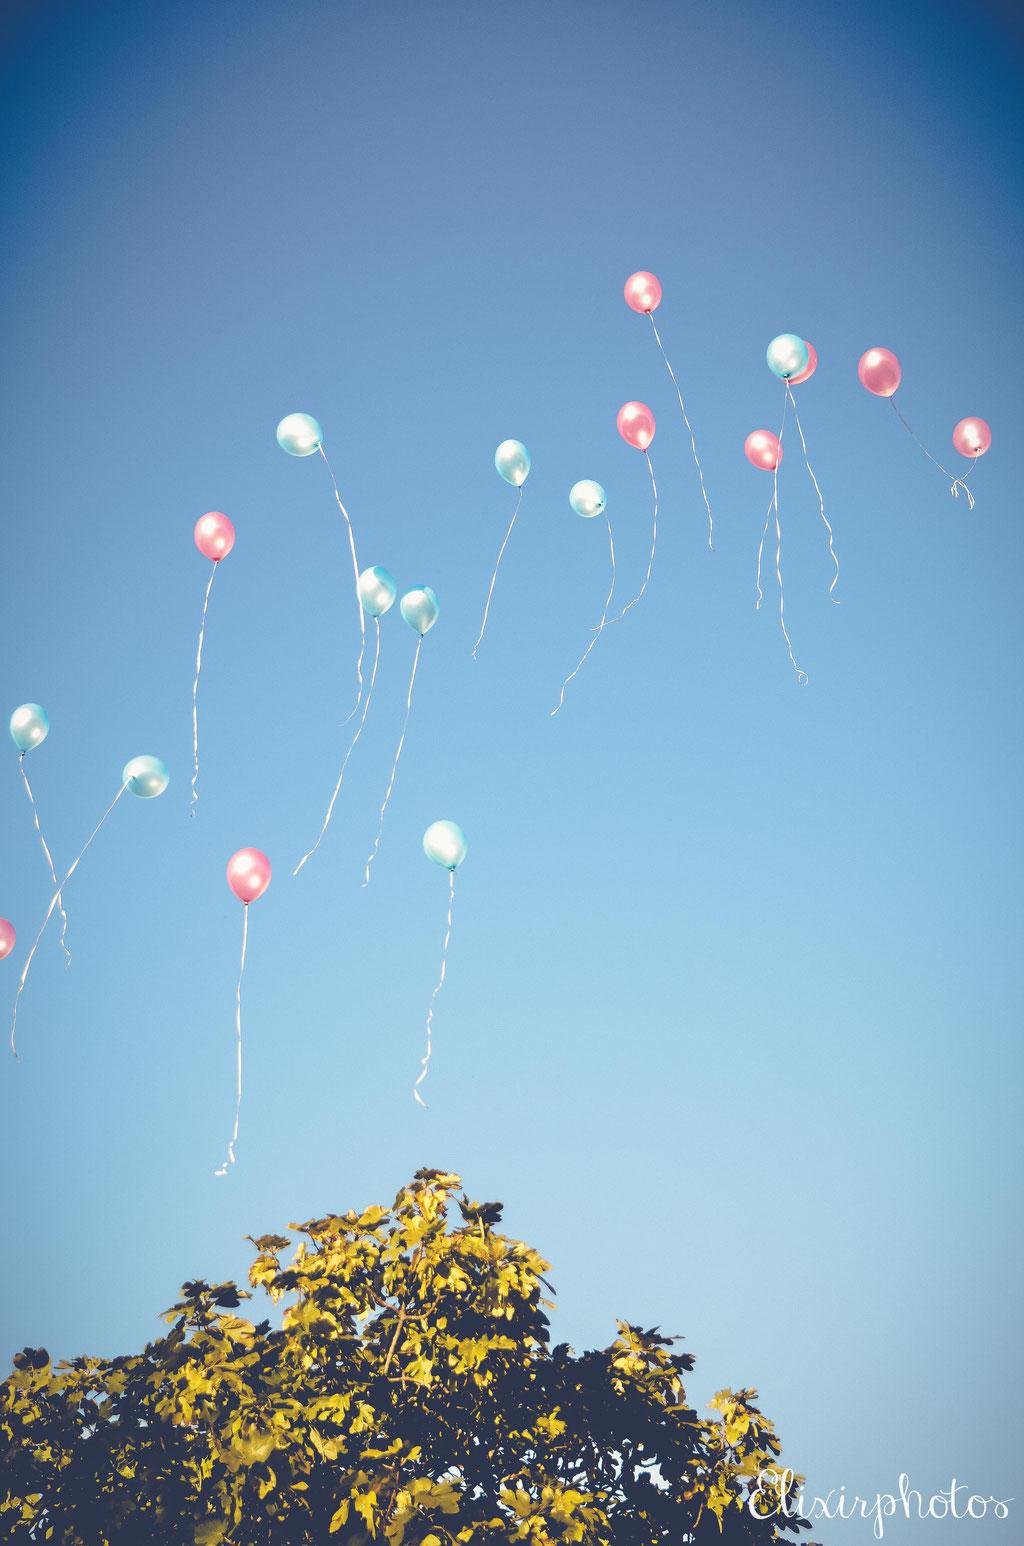 ballons rose bleu ciel